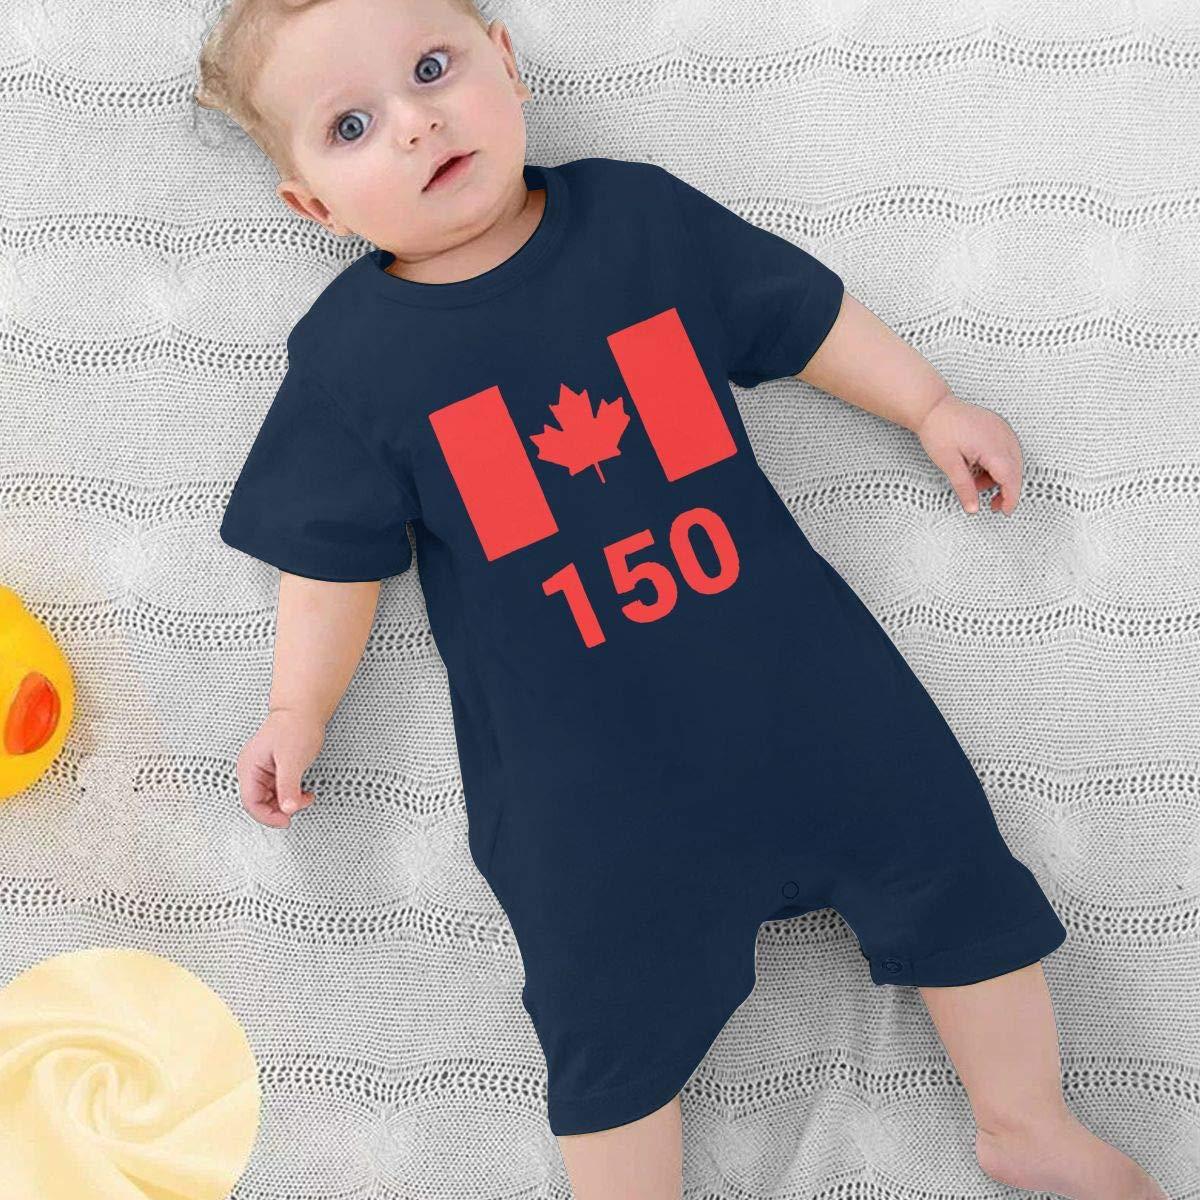 UGFGF/&3 Canada 150 Newborn Baby Short Sleeve Bodysuit Organic Coverall 0-24 Months